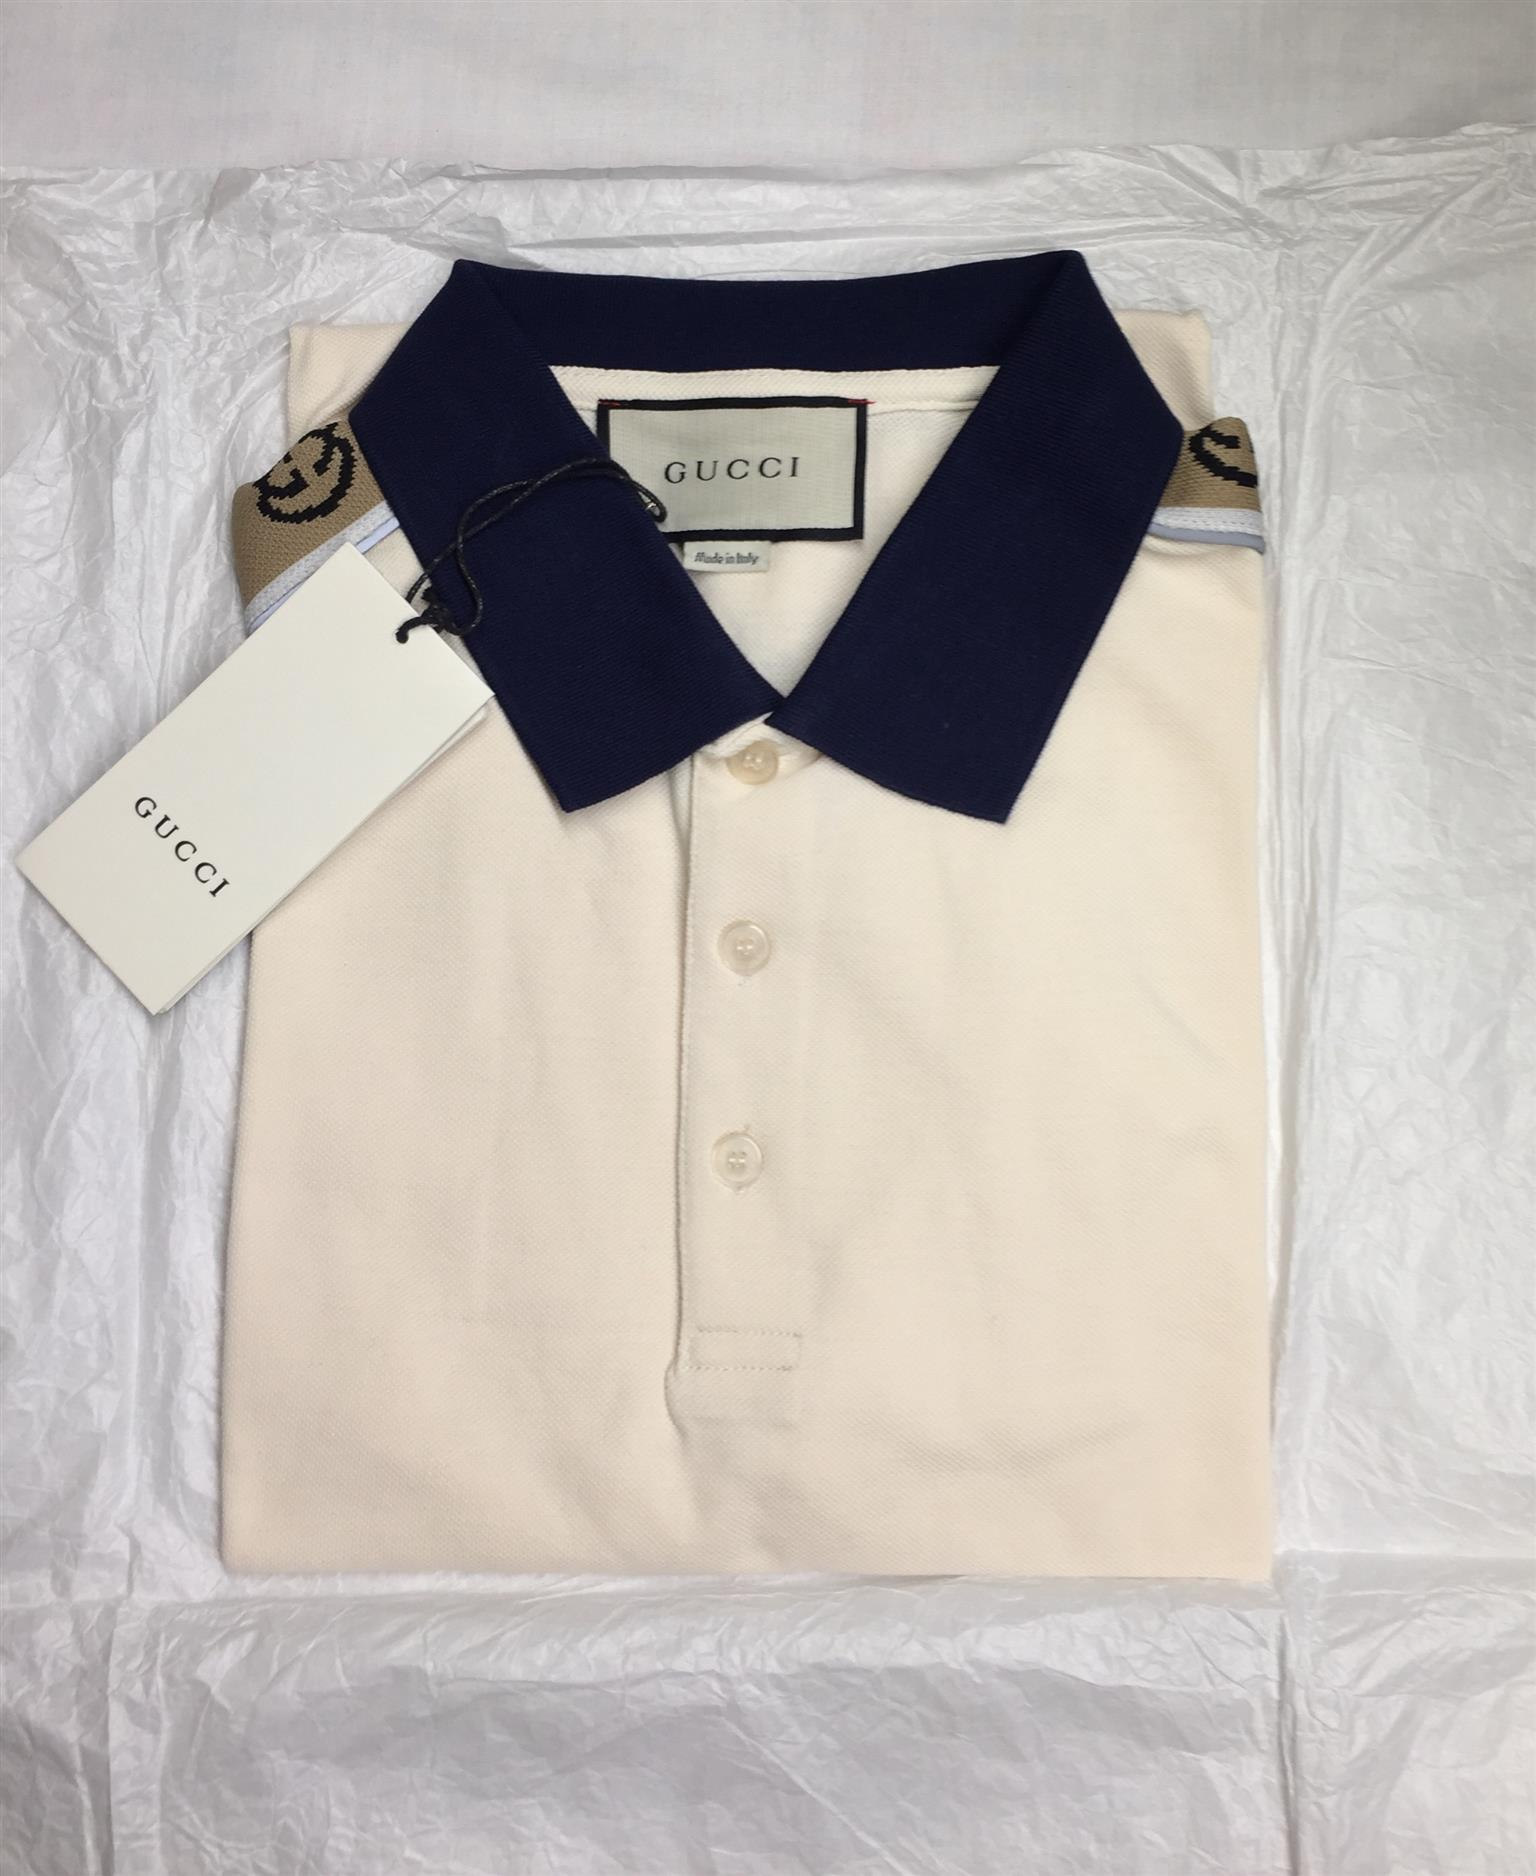 G U C C I  Mens Polo Shirts—GG Monogram Stripes, Size (M), Ivory Colour